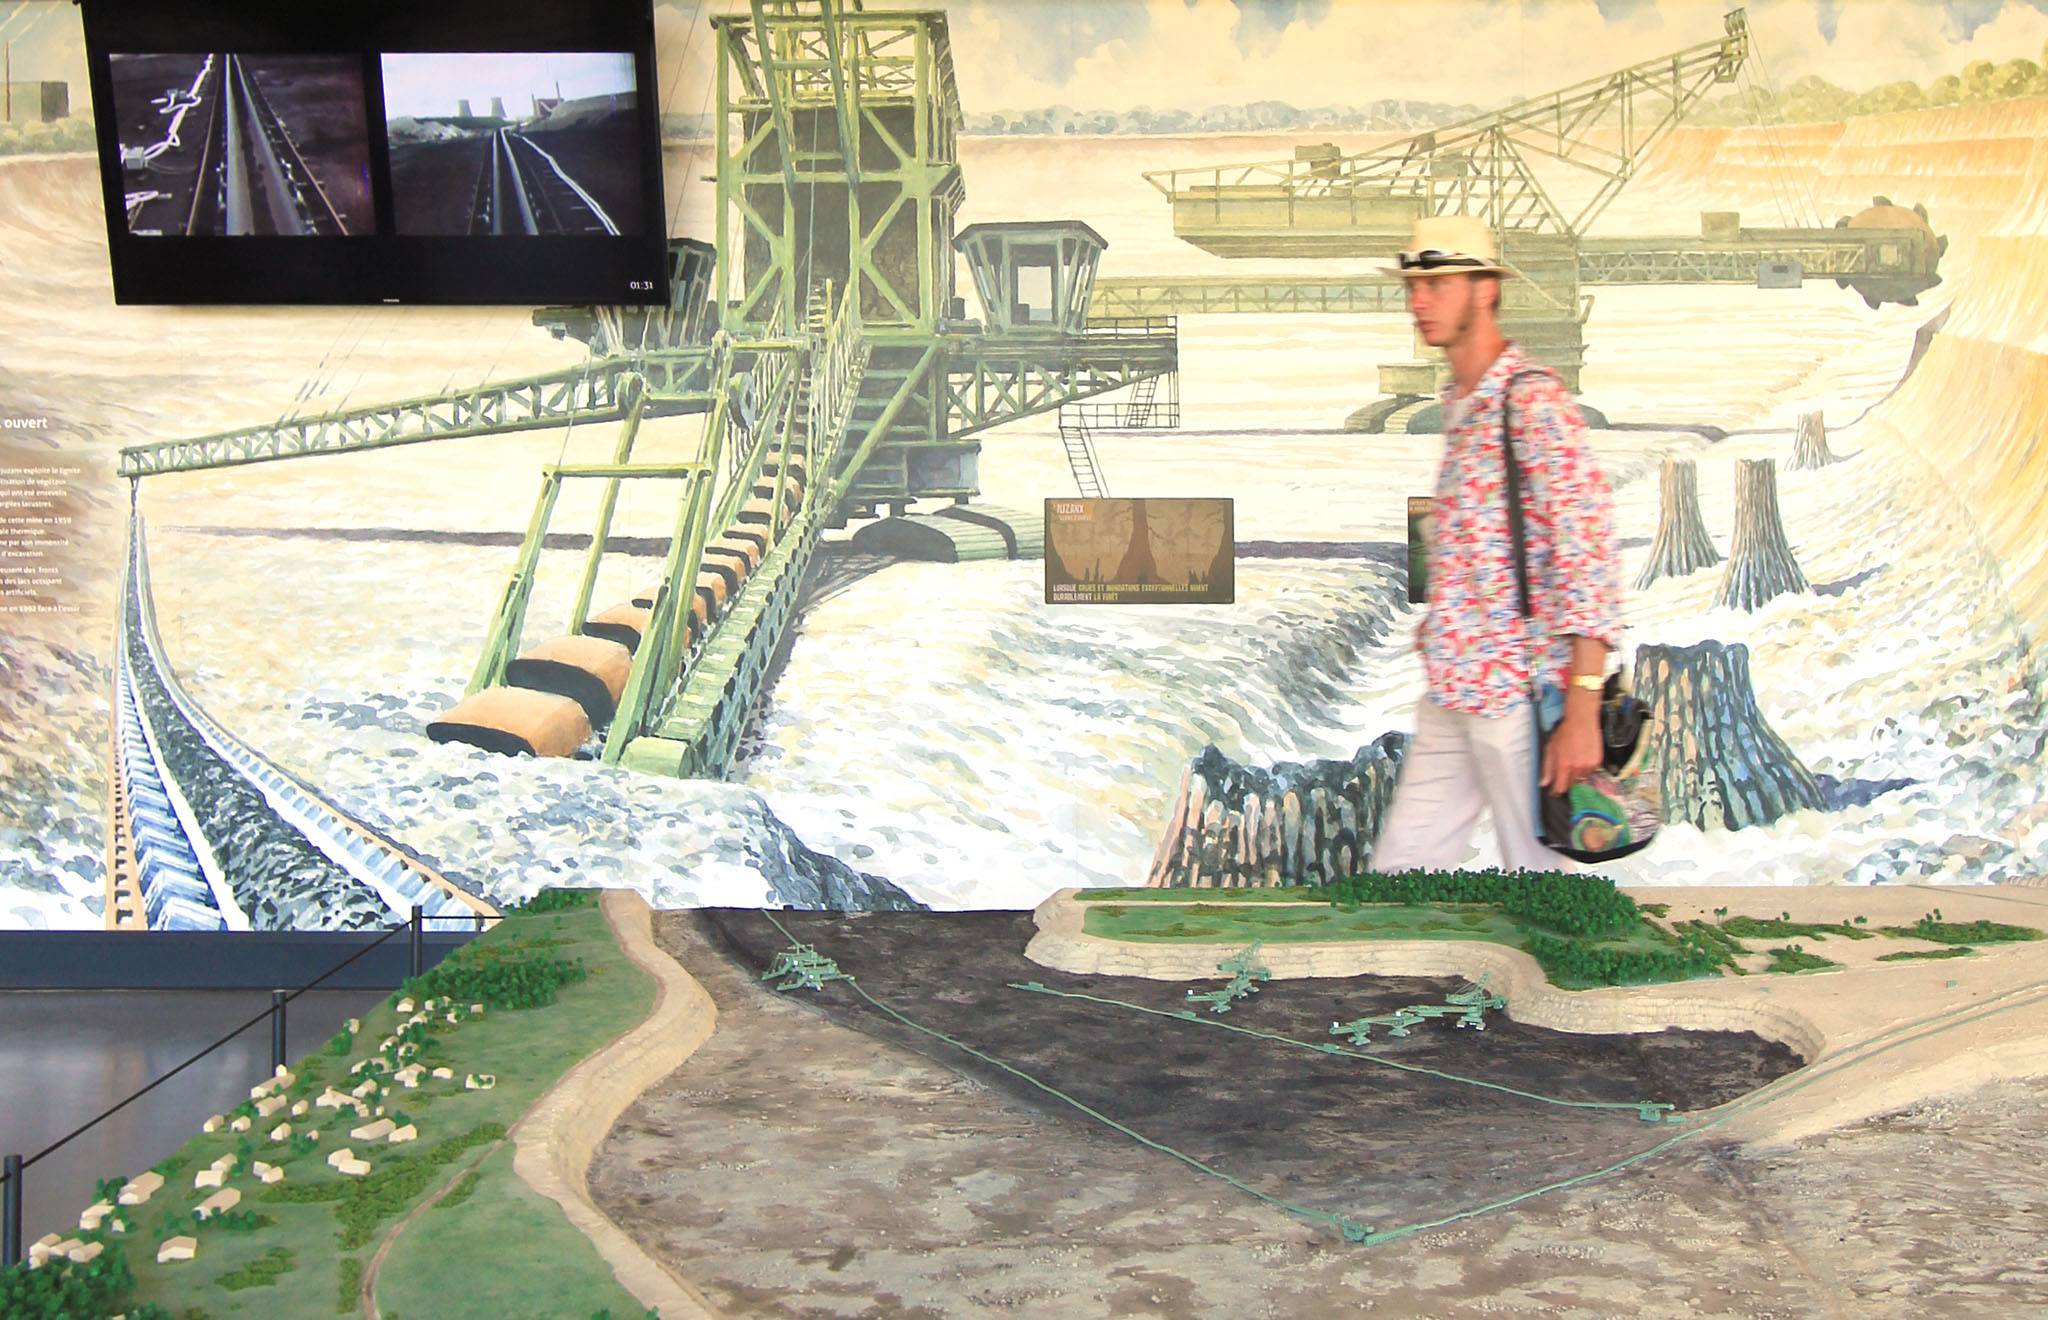 maskarade-scenographie-arjusanx-maison-de-site-loisir-industrielle-fresque-murale-ecran